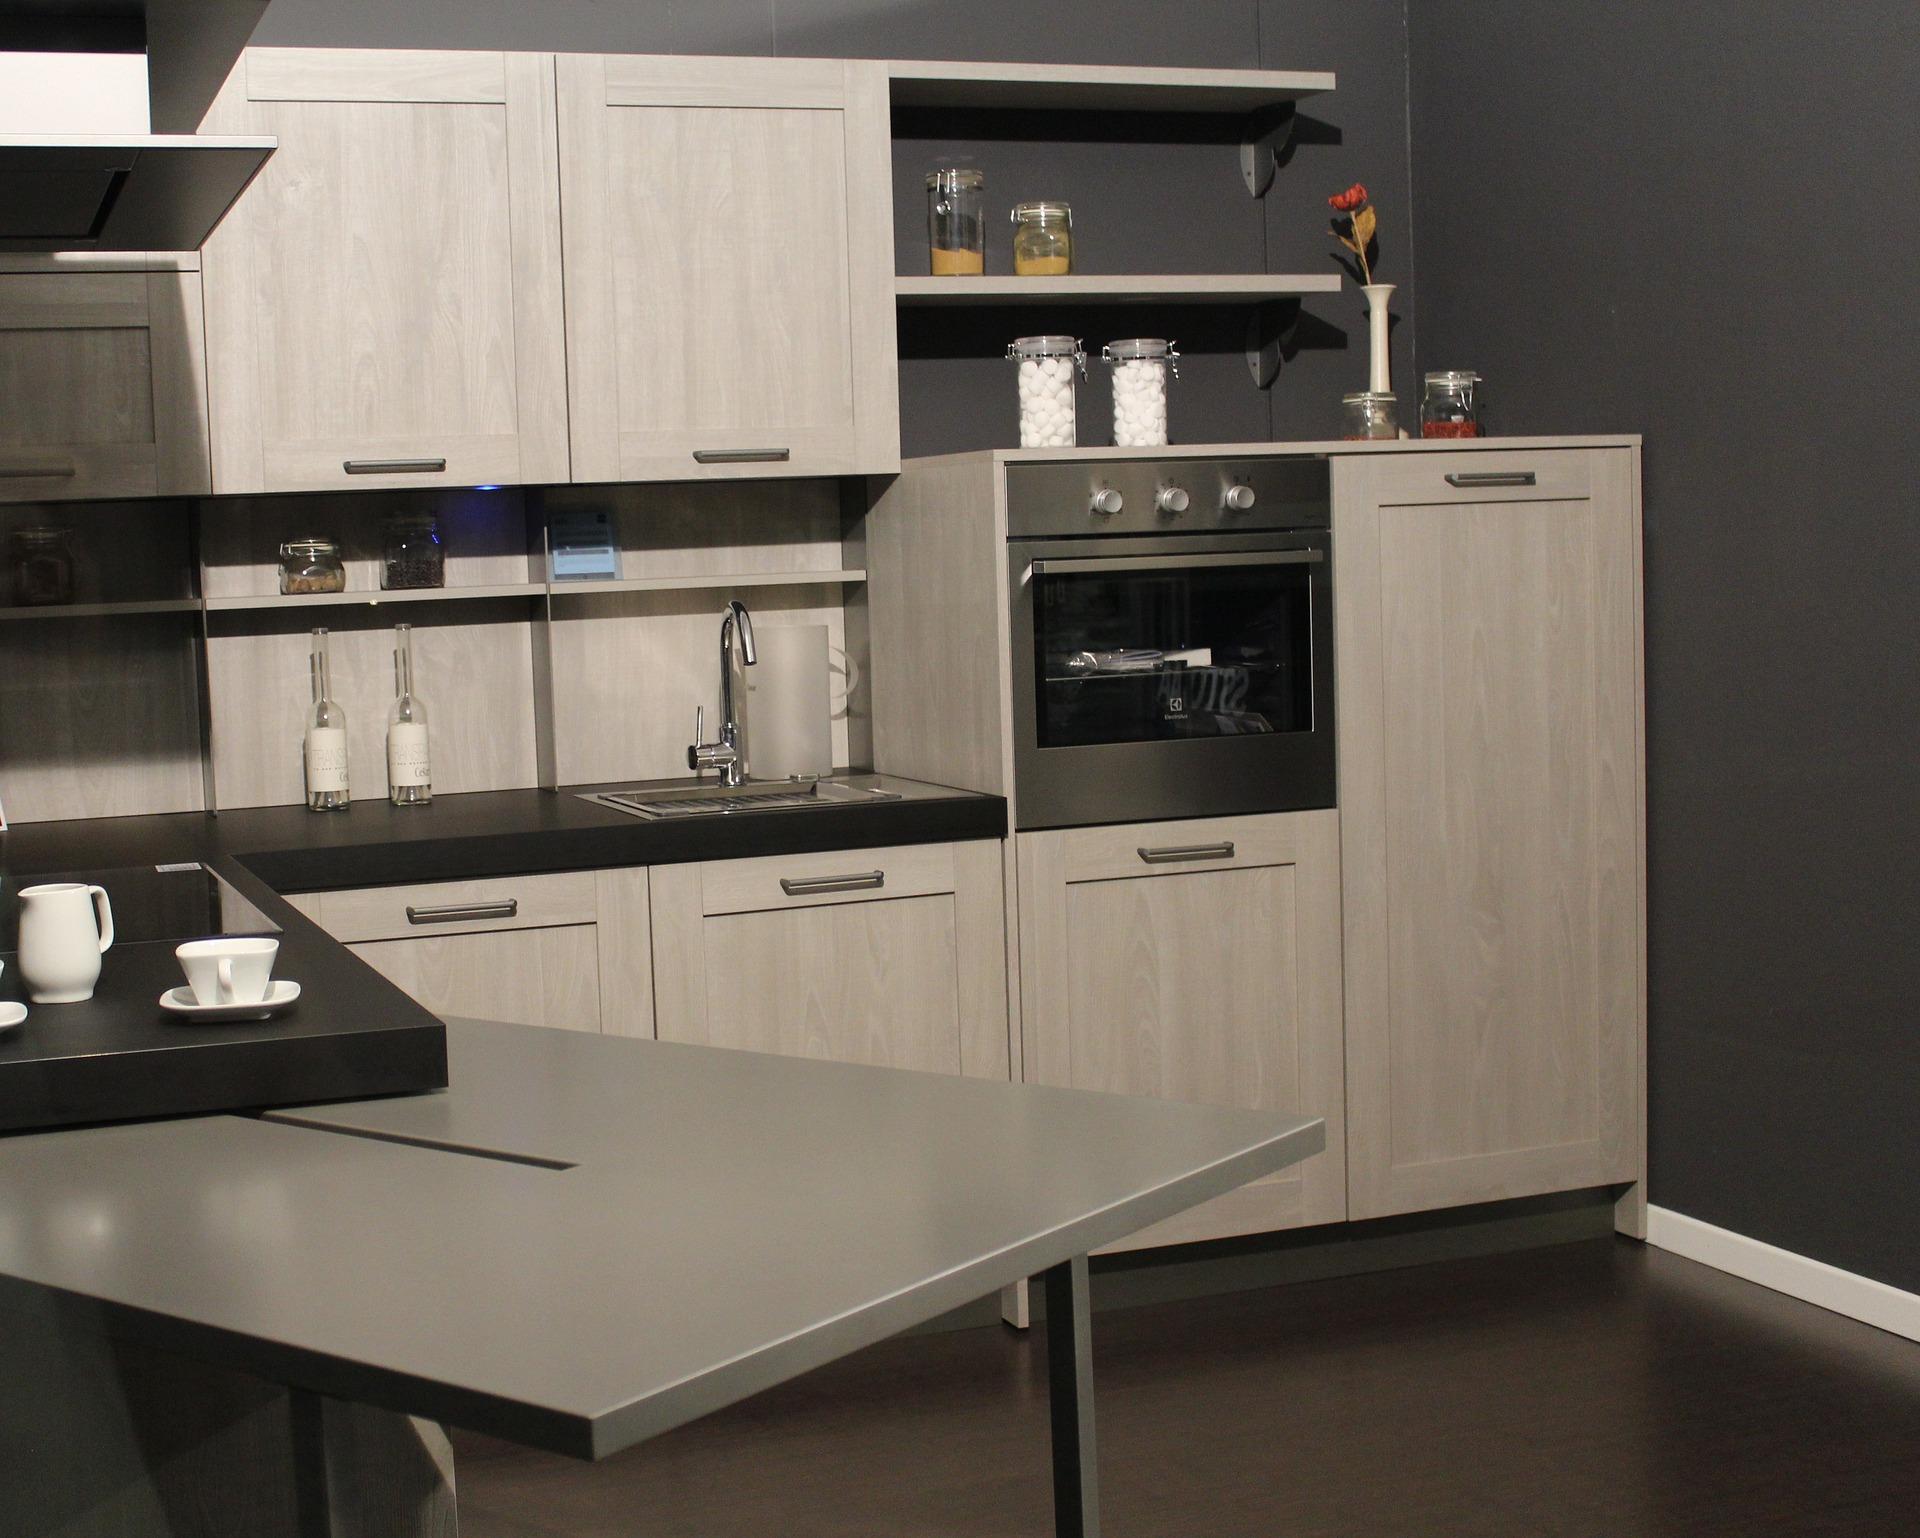 Naro ne meble kuchenne - Mensole per cucine ...